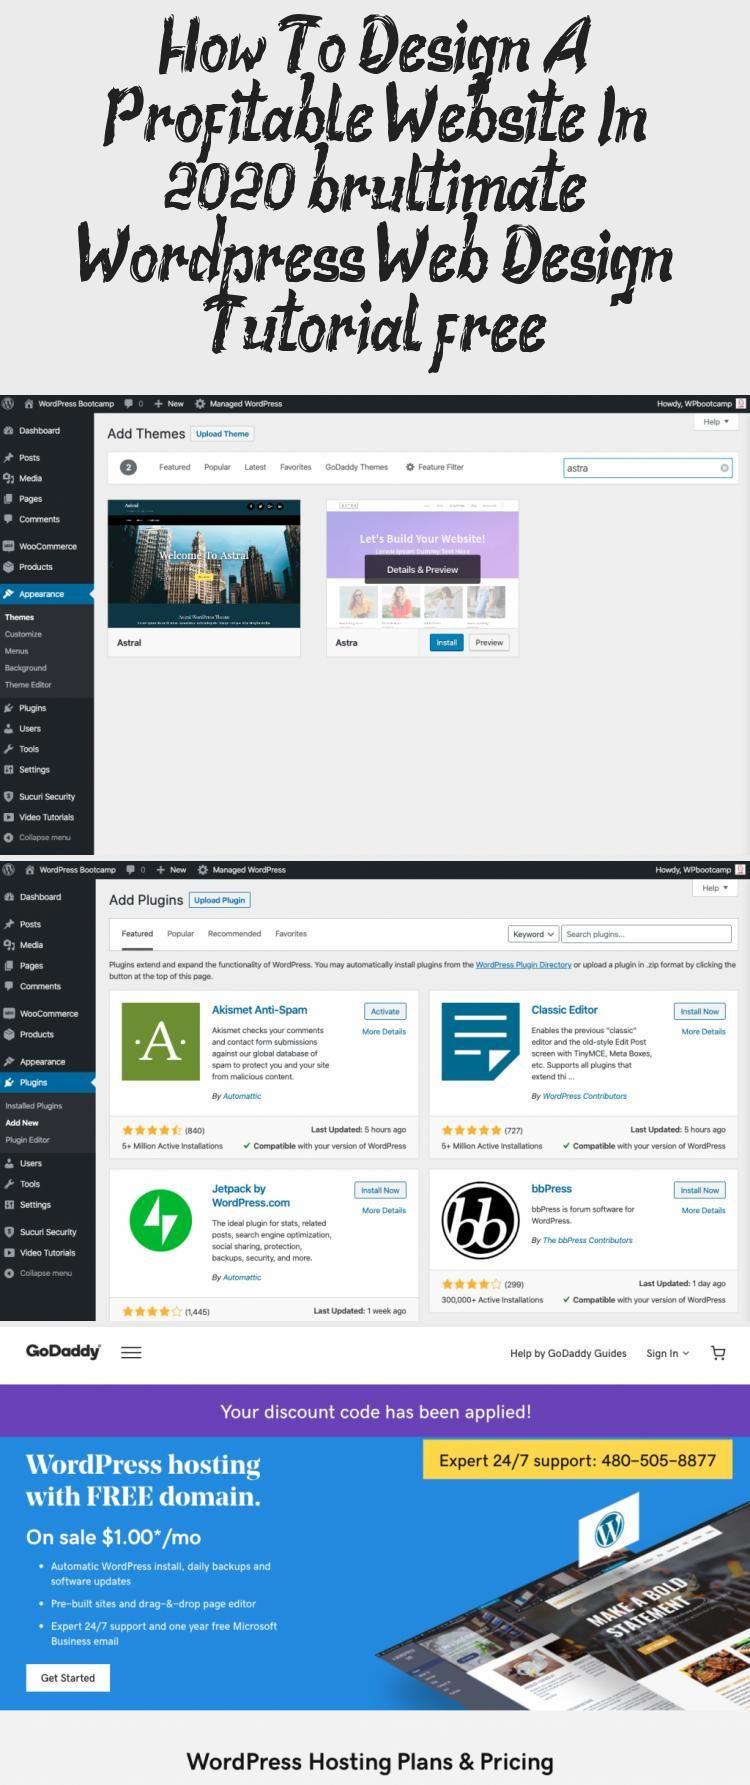 How To Design A Wordpress Website In 2020 Step By Step Tutorial Web Design Tutorials Mentor Program Create Website